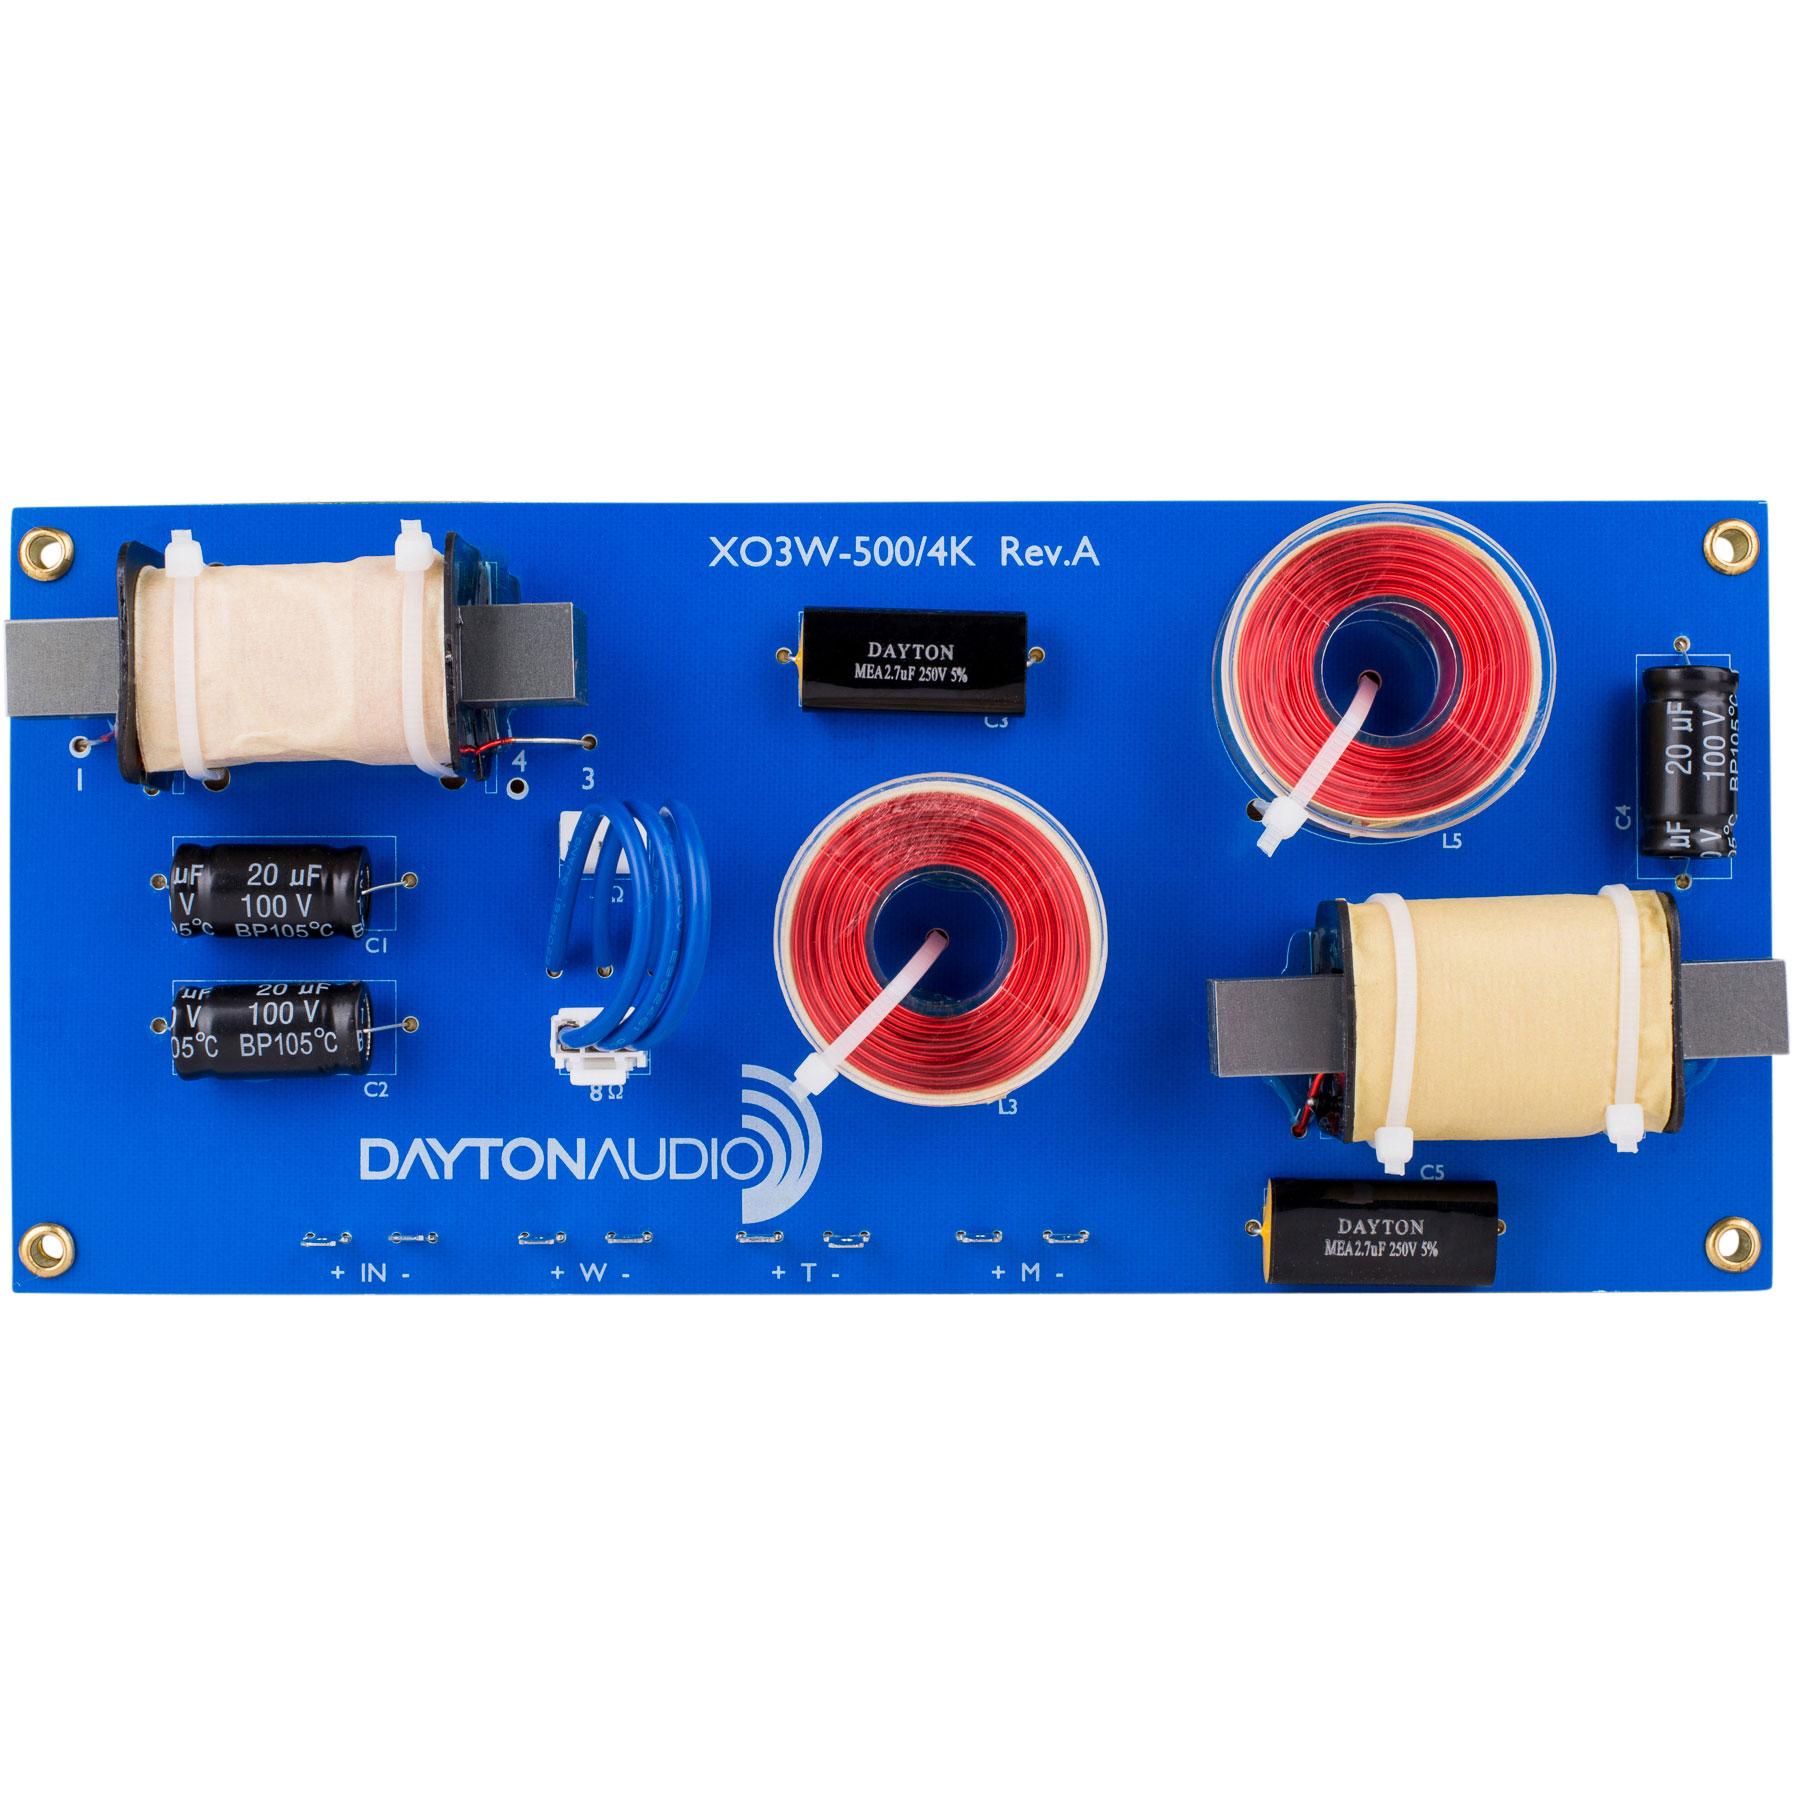 Dayton Audio XO3W-500/4K画像